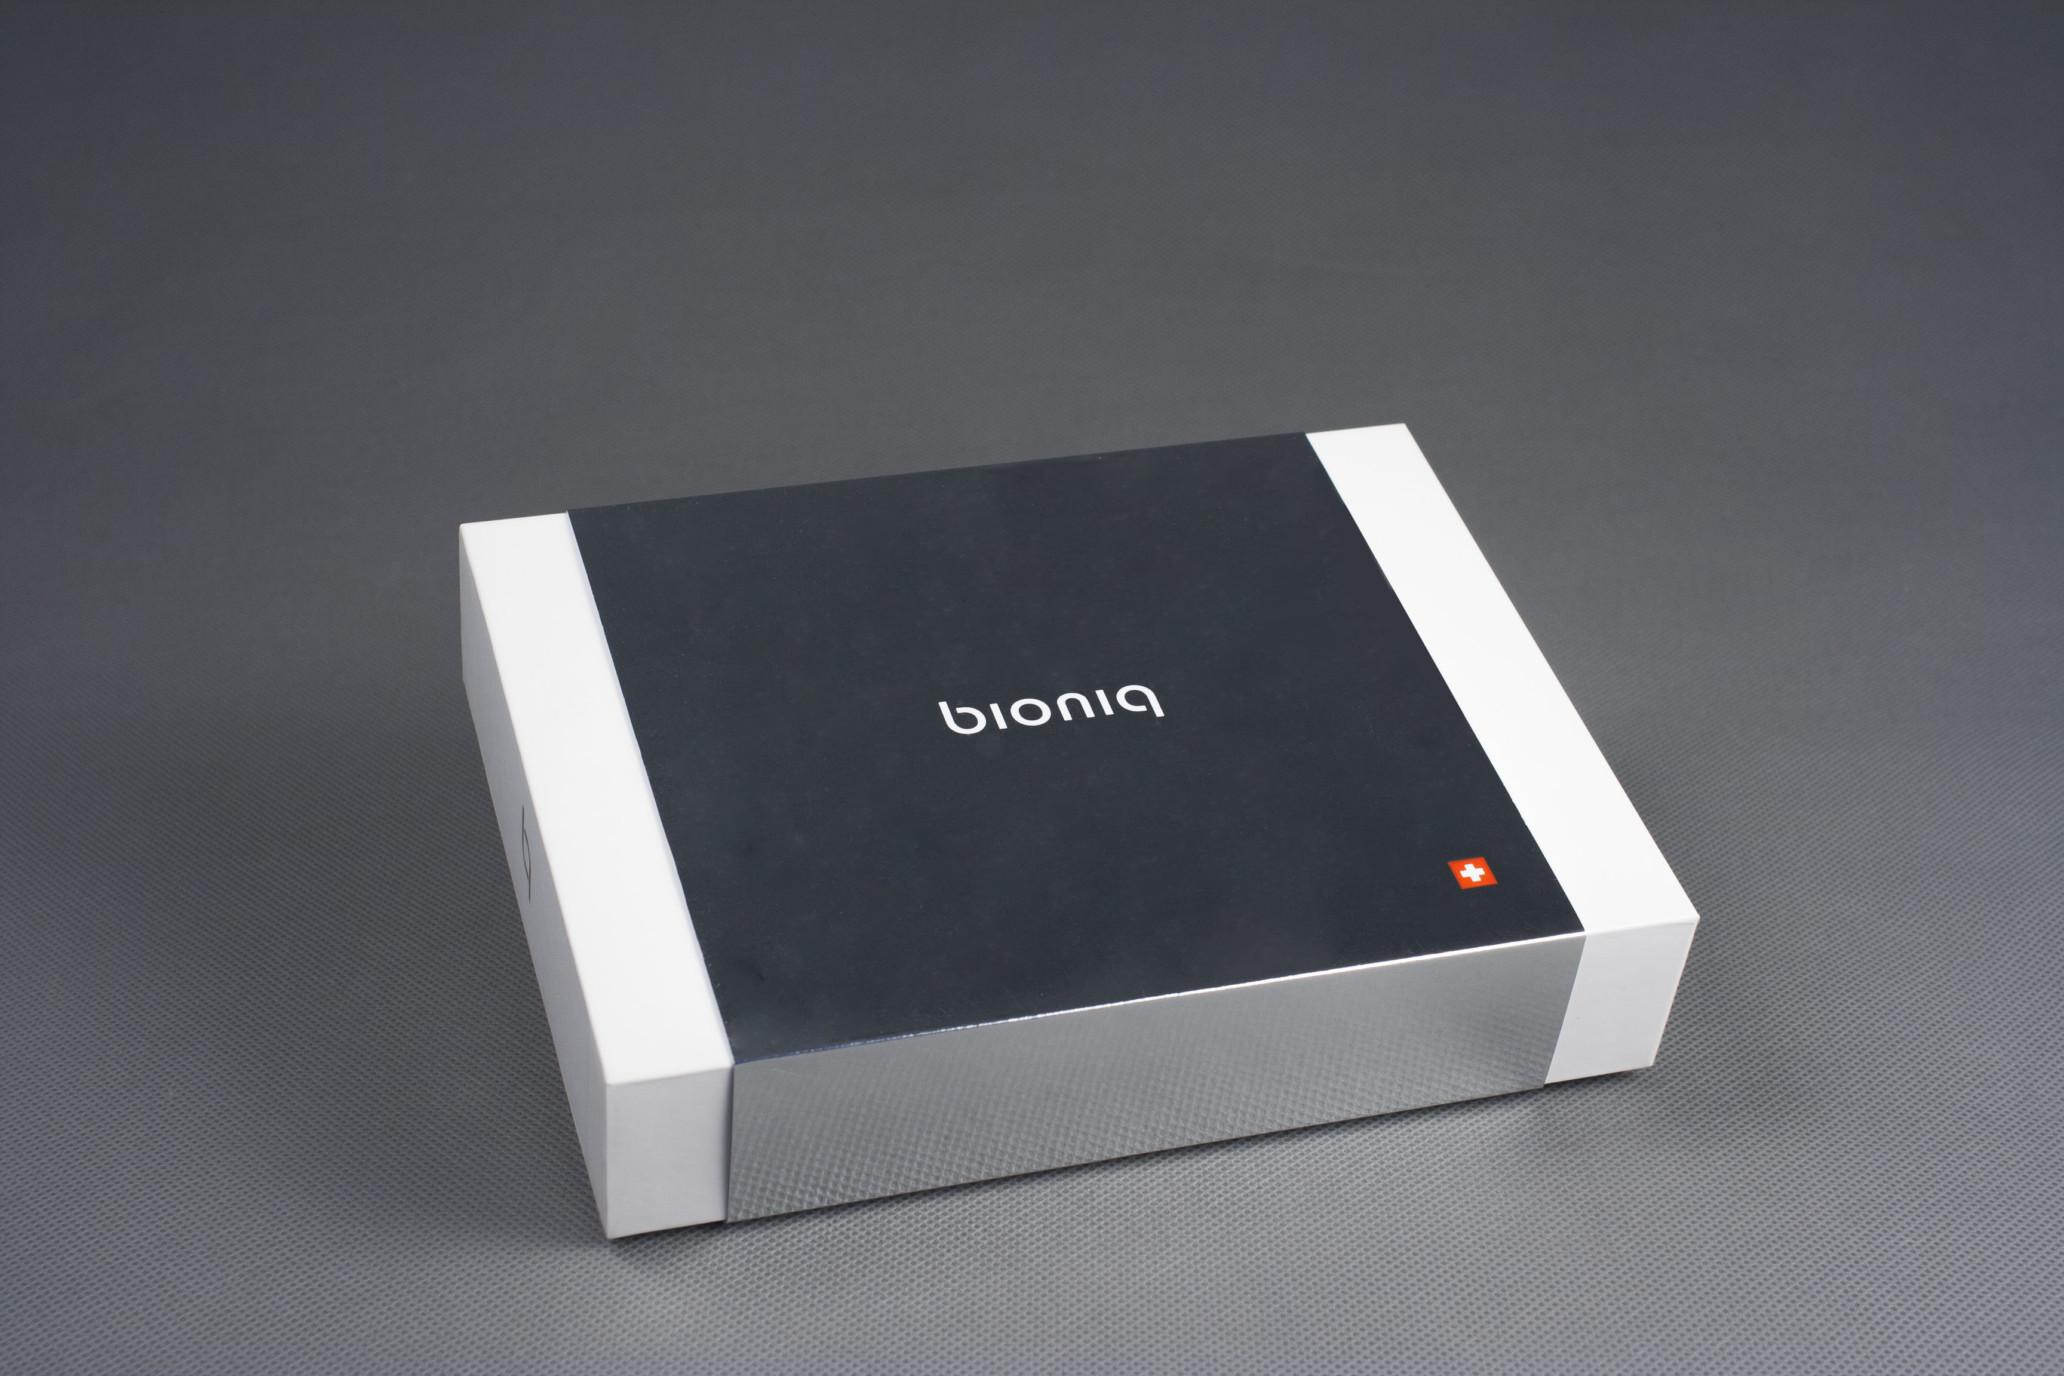 Коробка крышка-дно с обечайкой, заказ BIONIQ